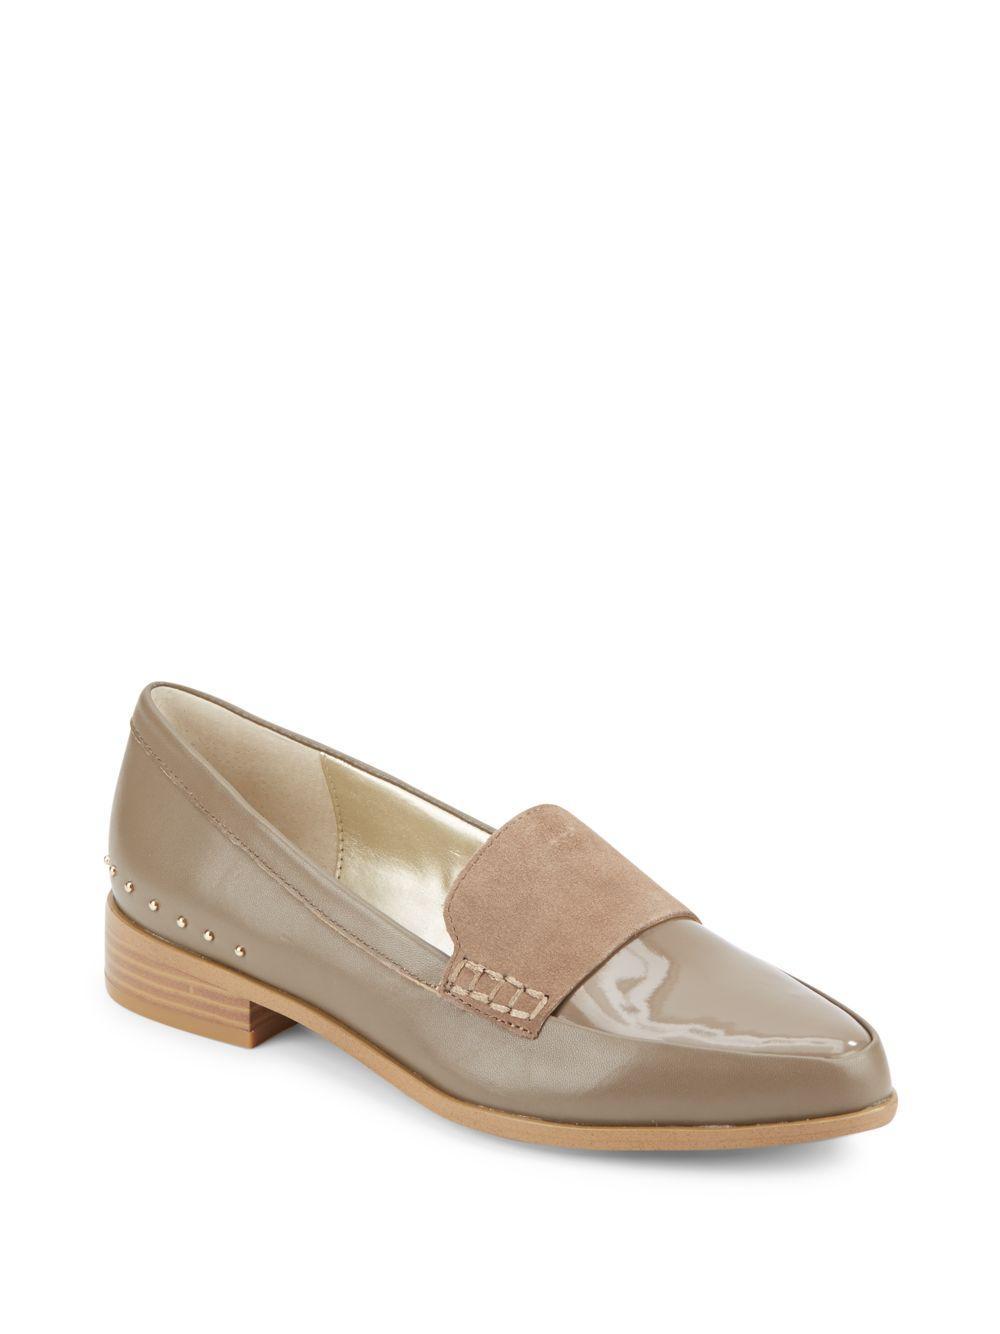 saks fifth avenue lorenna almond toe loafers lyst